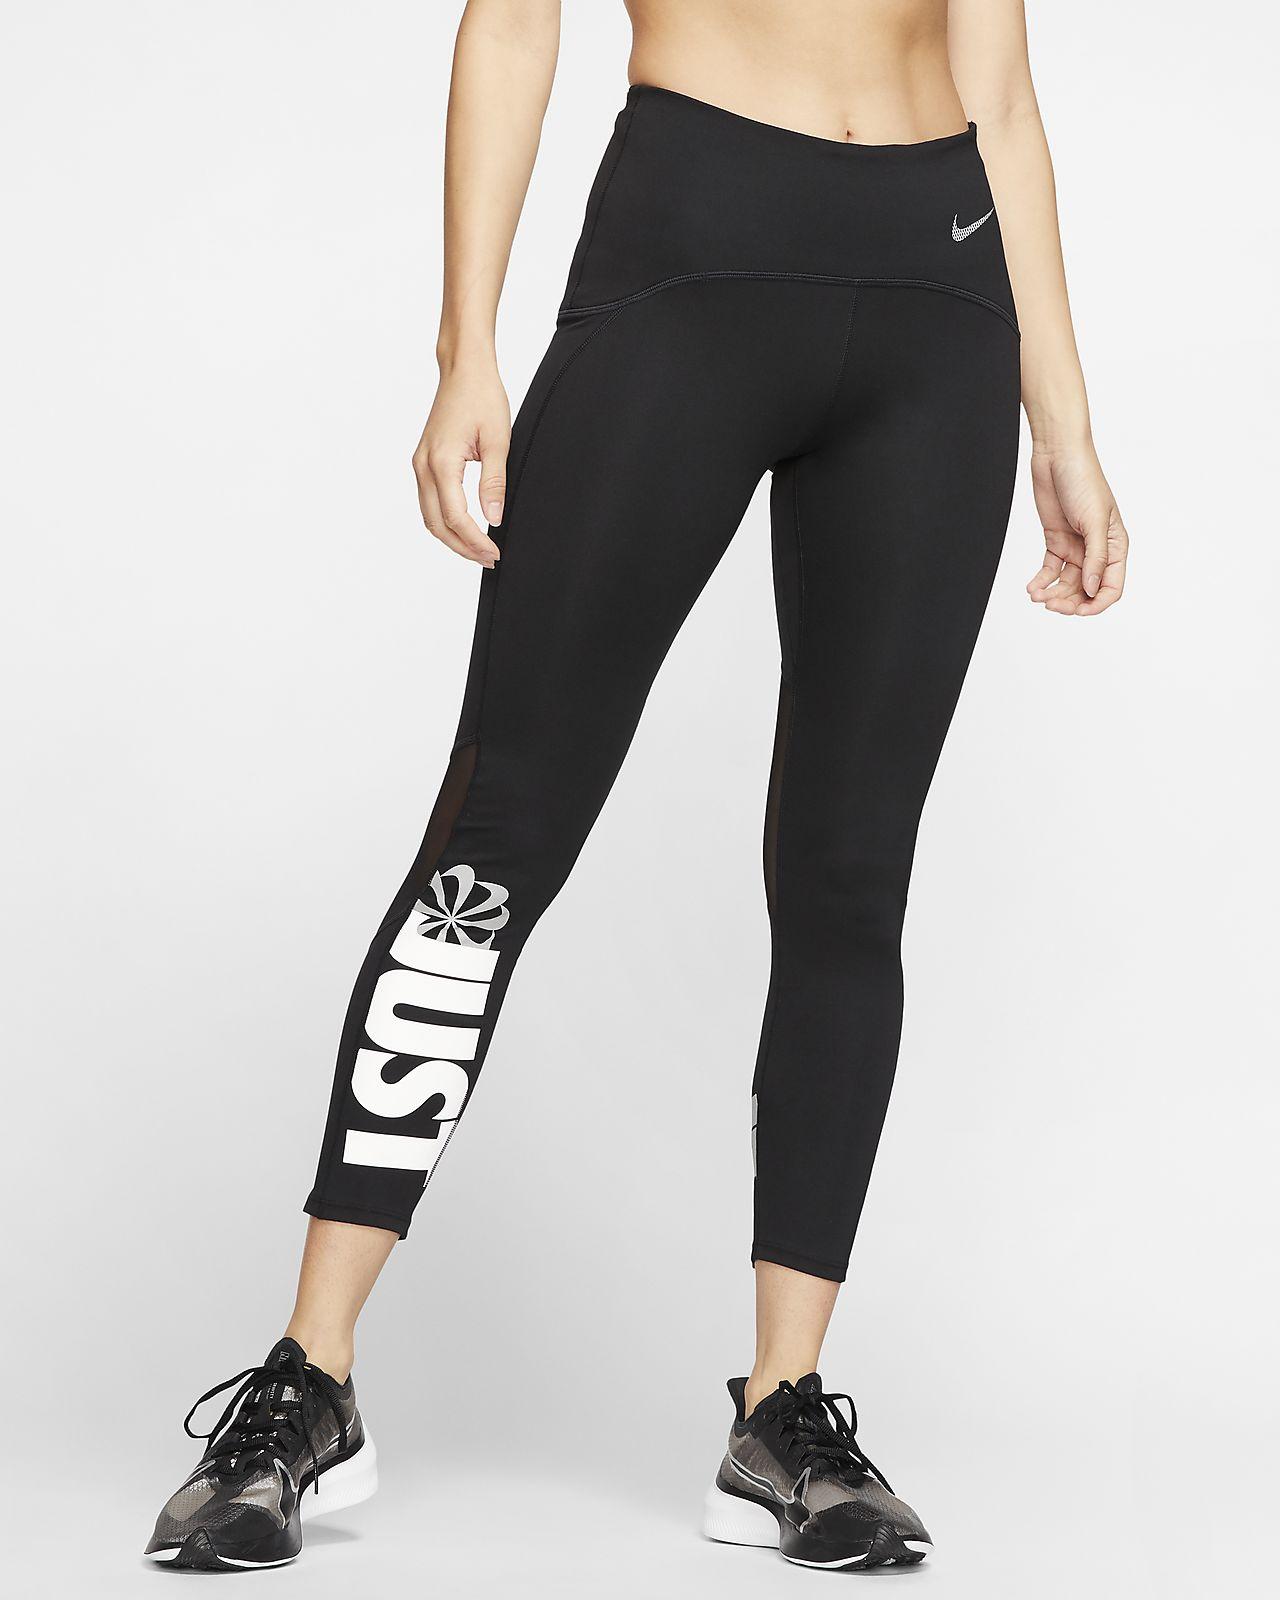 Legging de running 7/8 Nike Speed Icon Clash pour Femme